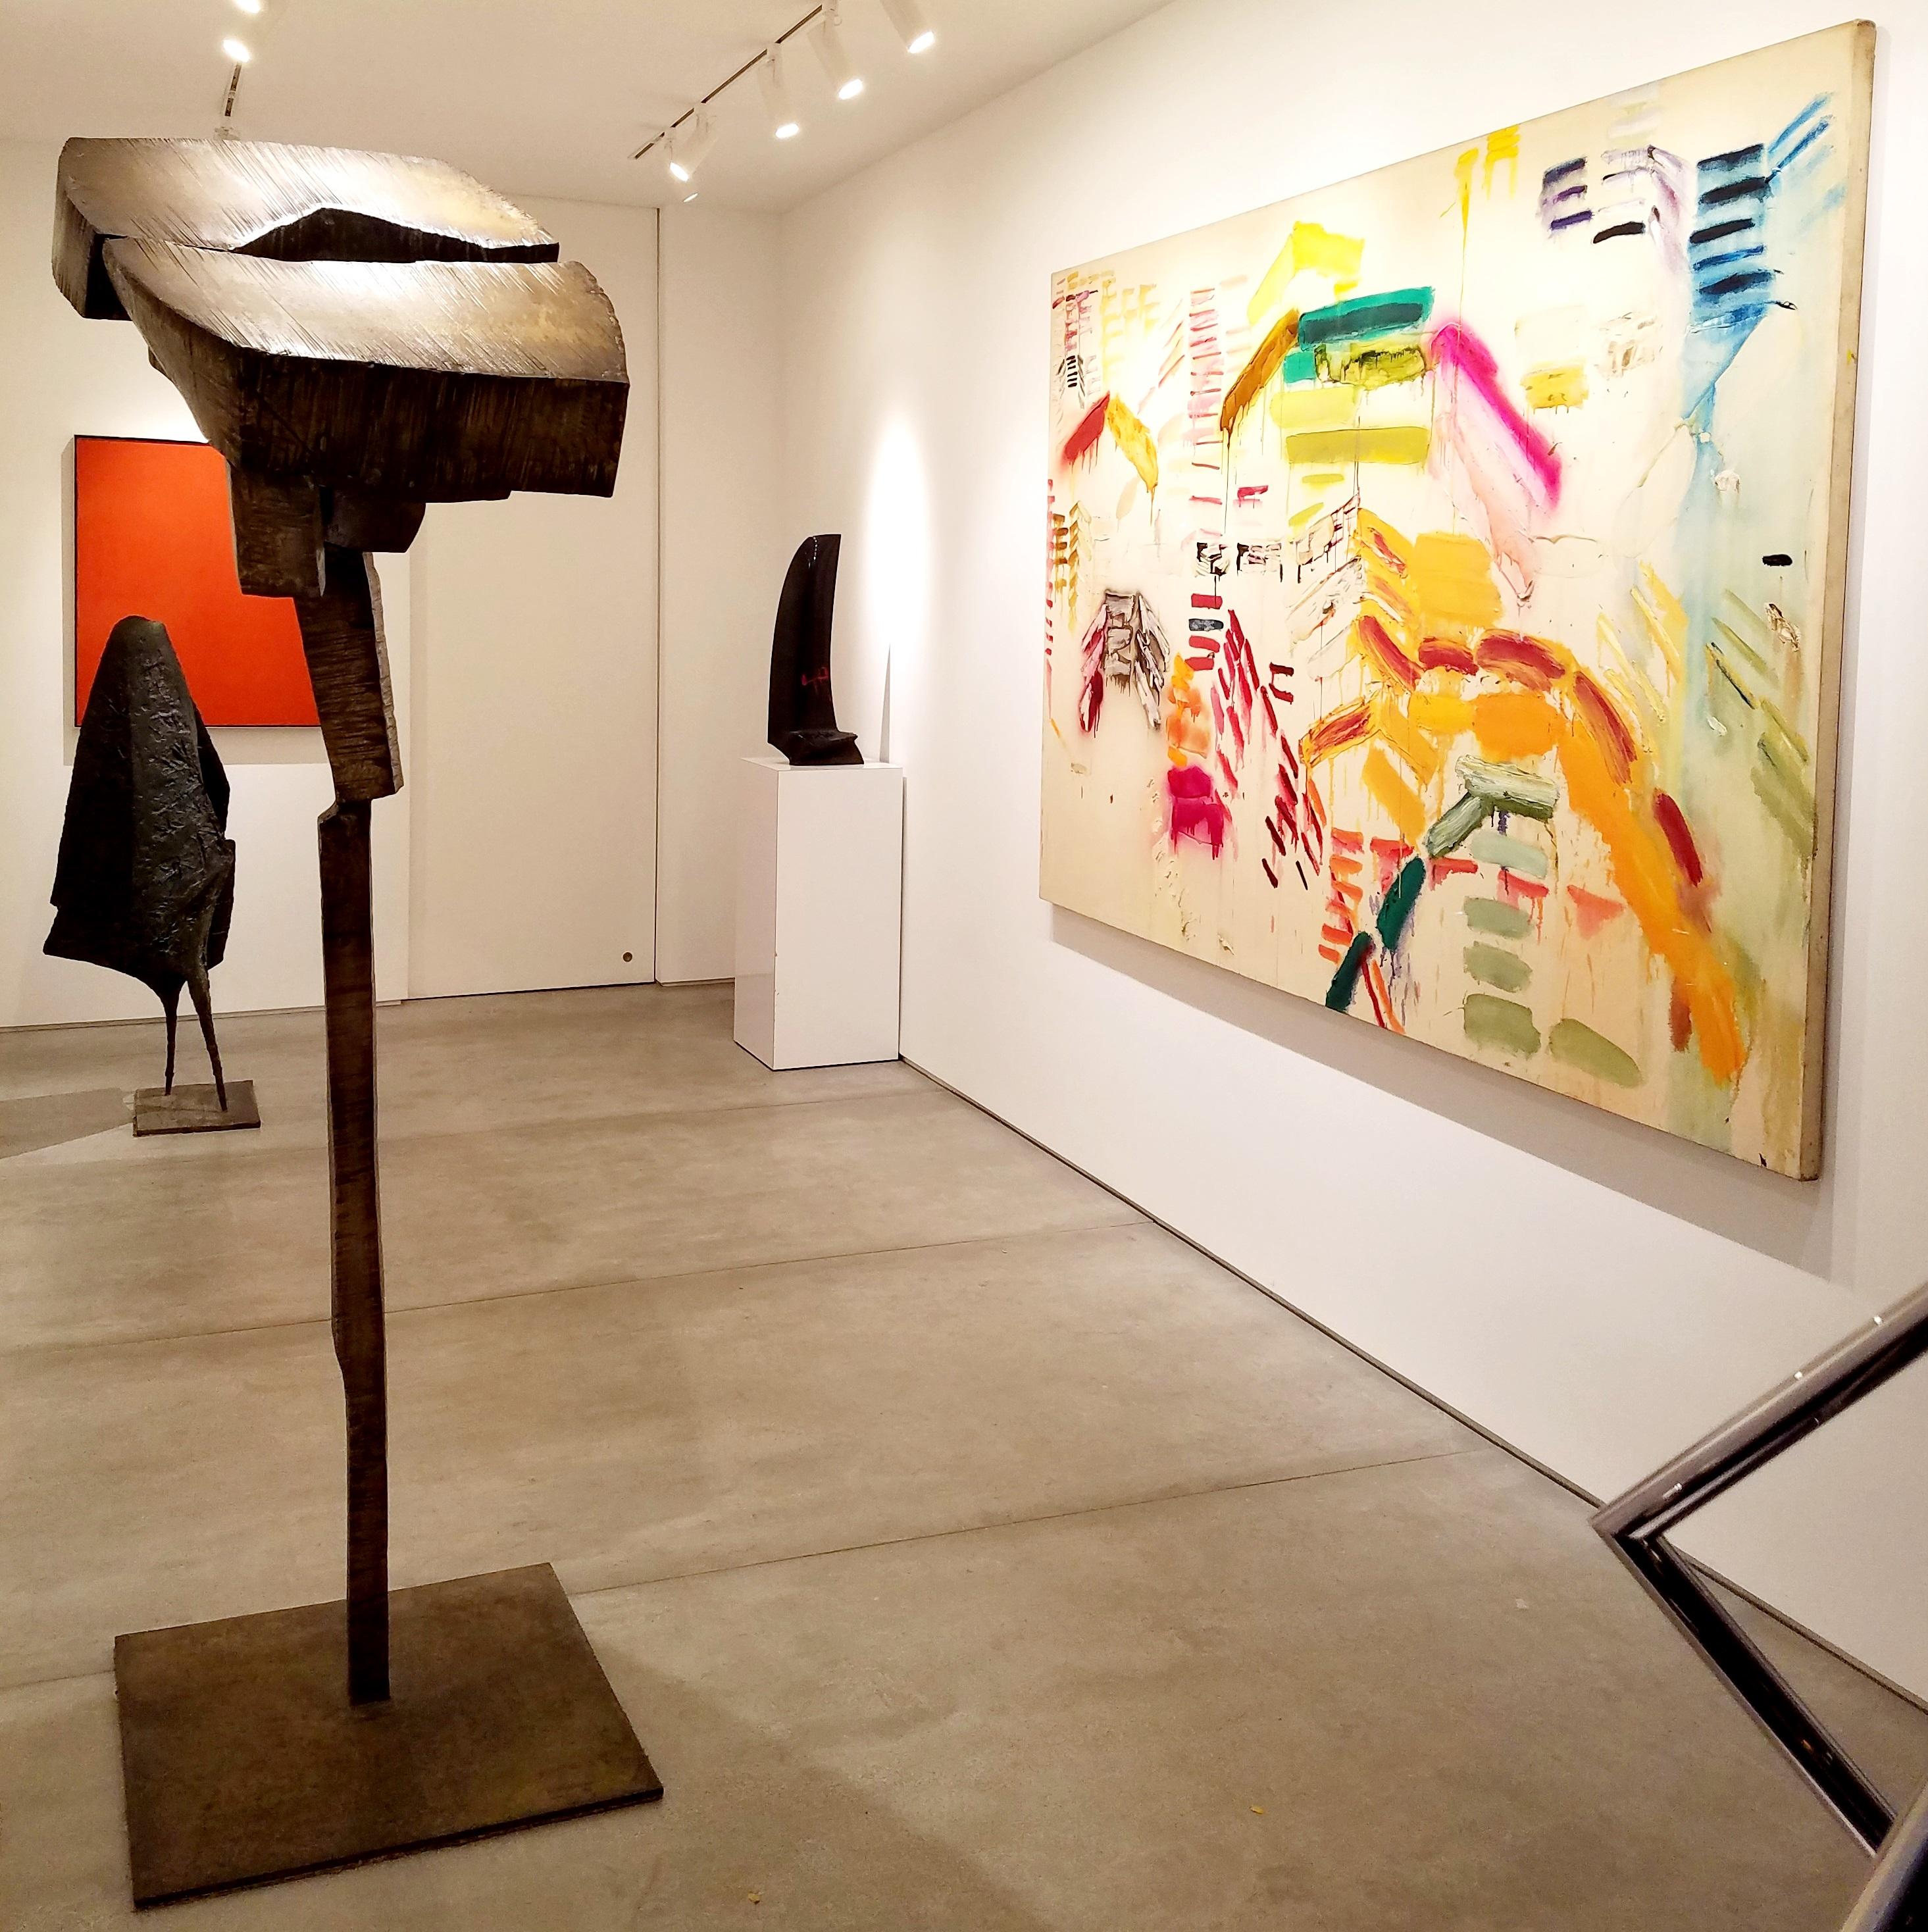 November 8, 2018 – 20th C. Art + Design @ Capsule Gallery NYC